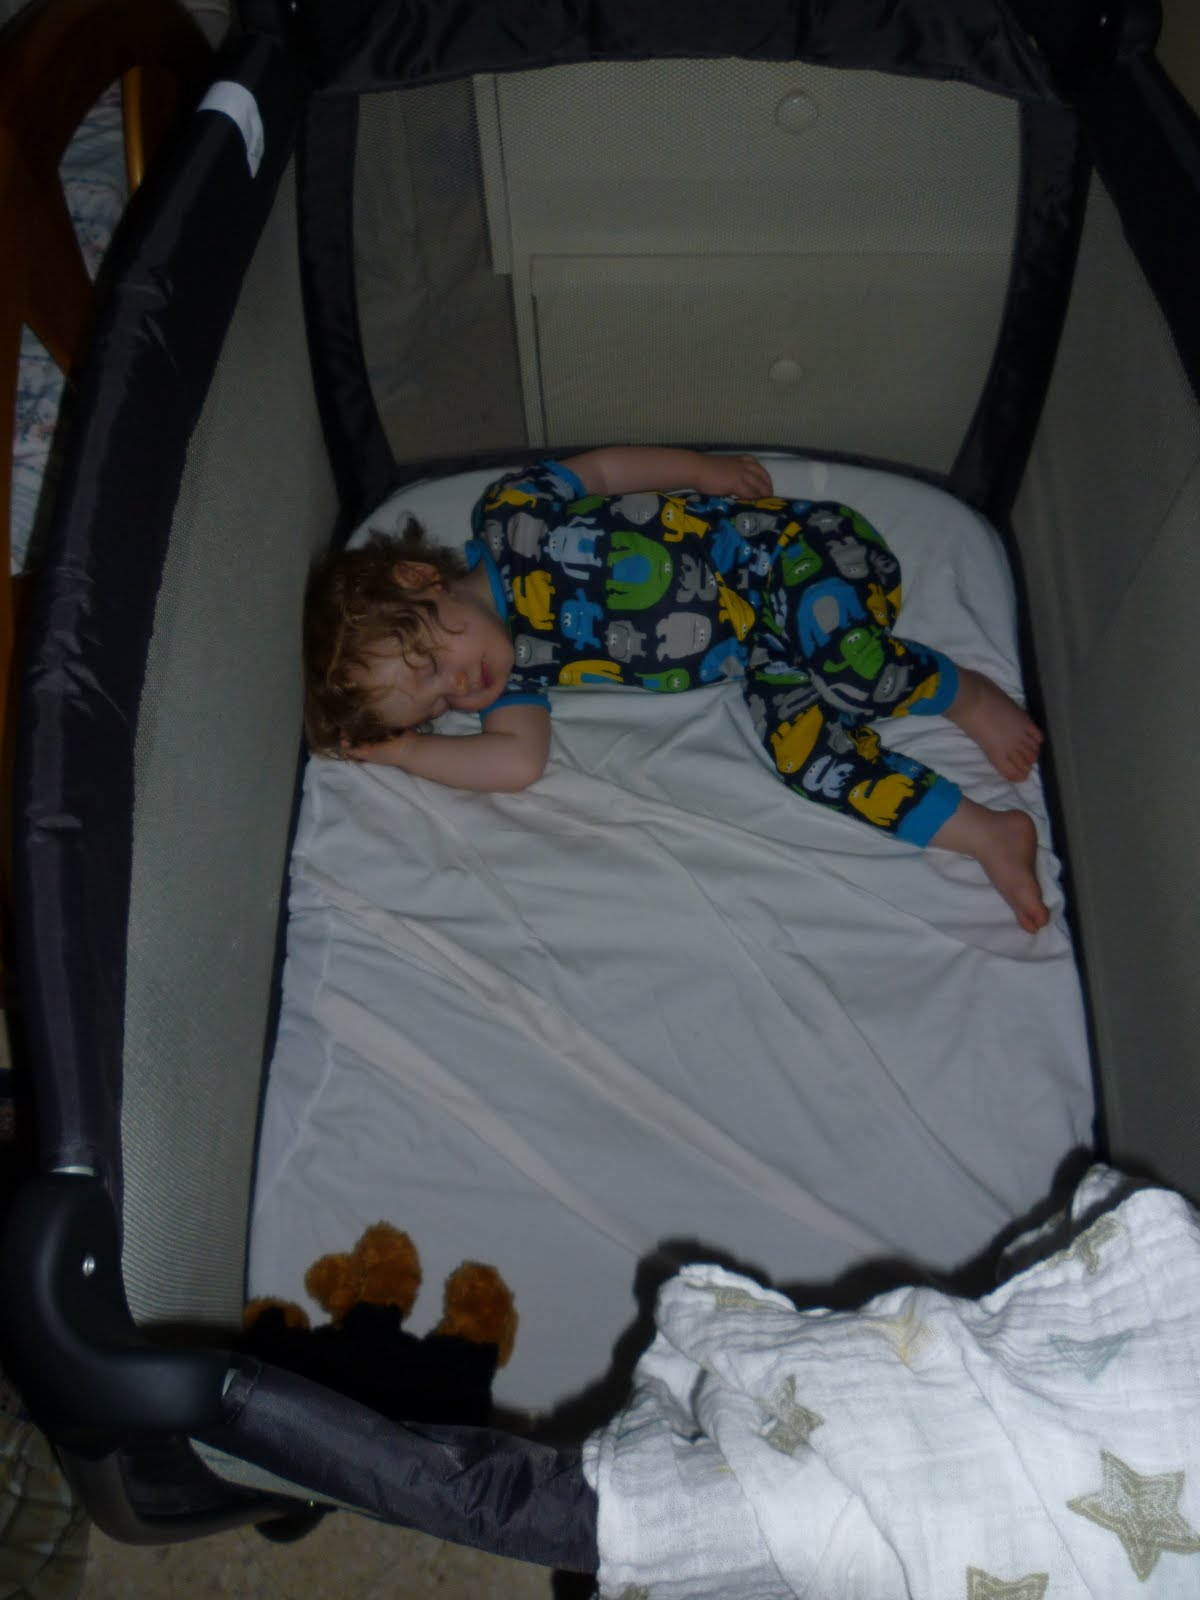 Transatlantic Blonde Mamas and Papas Sleep Travel Cot